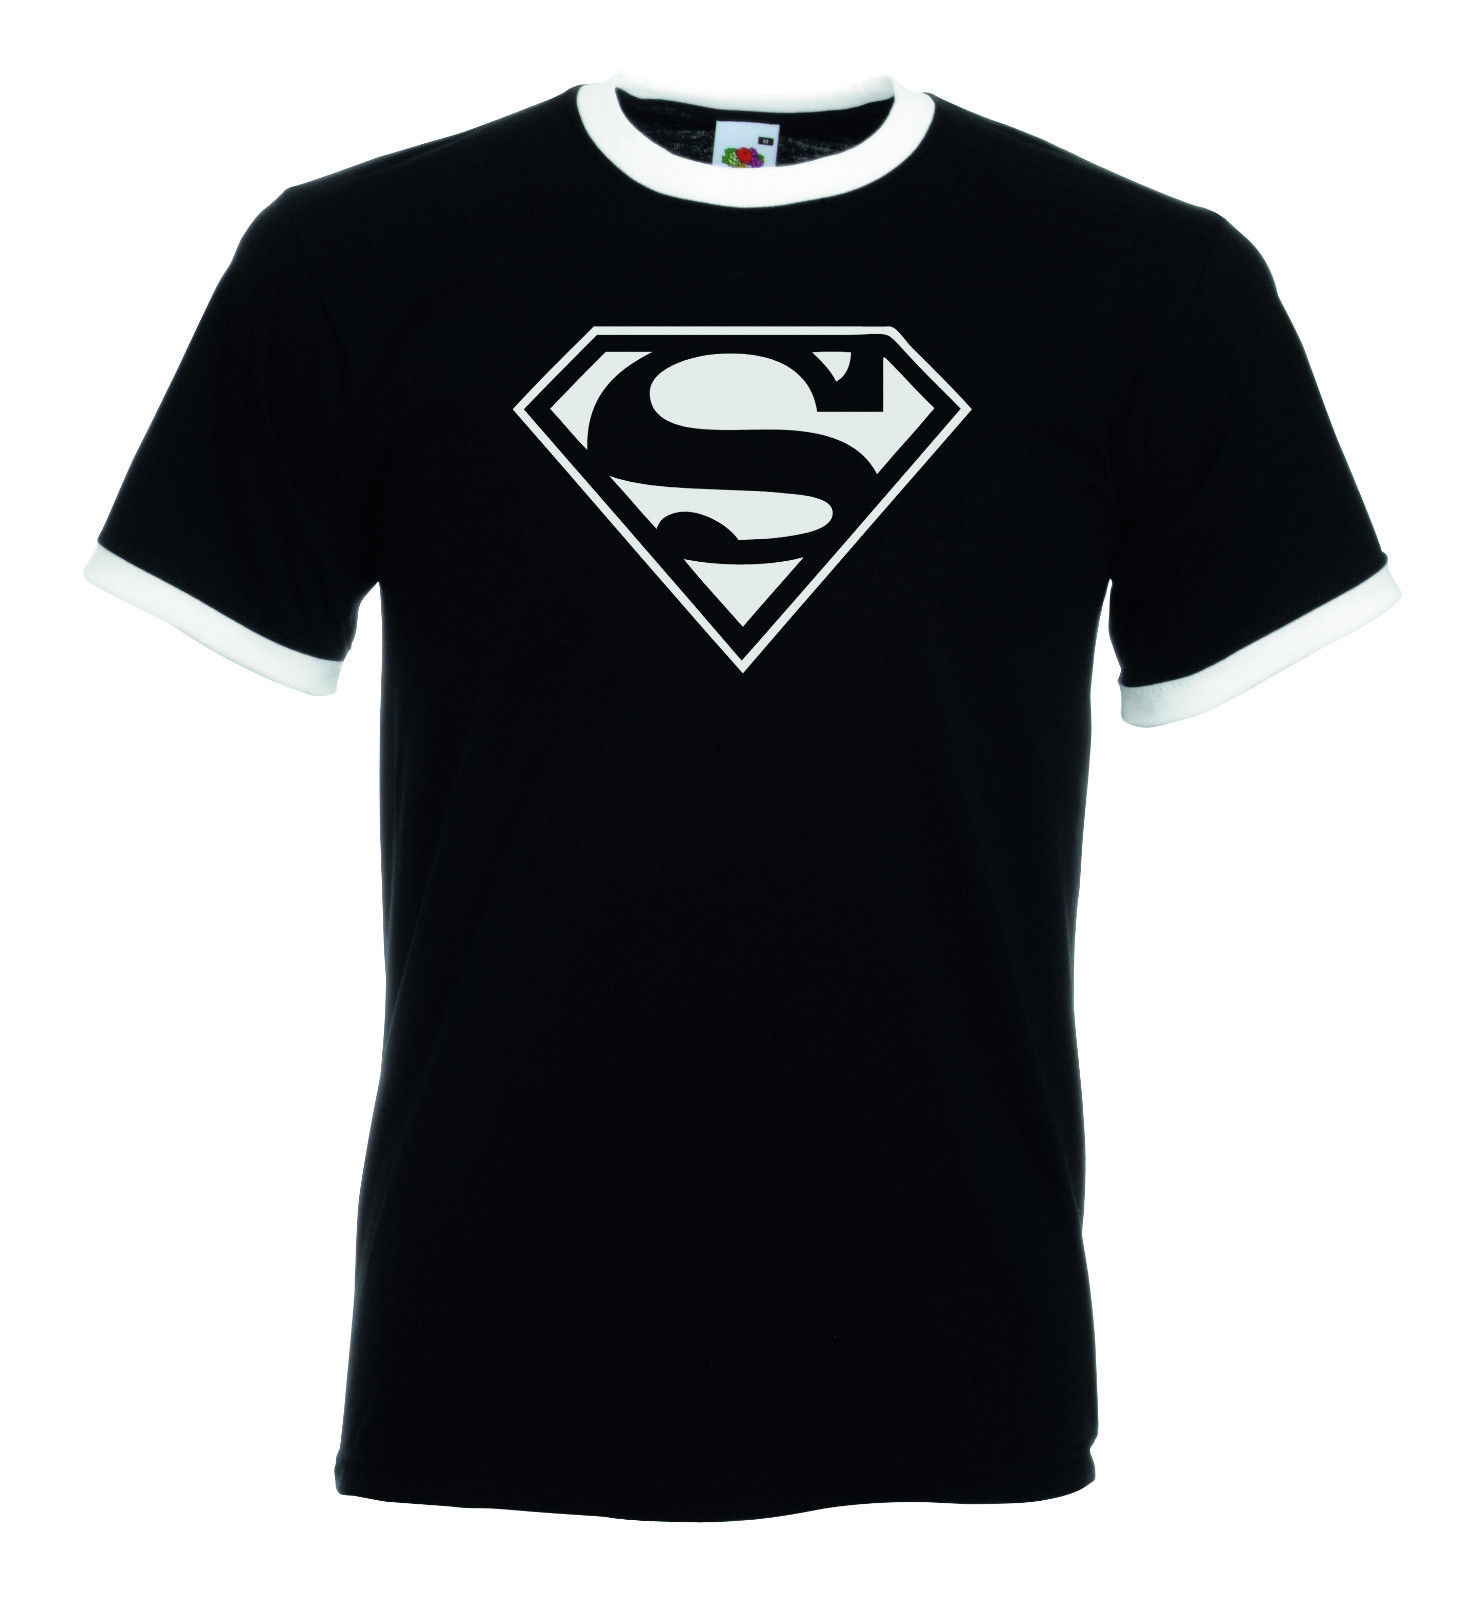 Superman retro t shirt super hero comic t shirt stag do t for Retro superhero t shirts